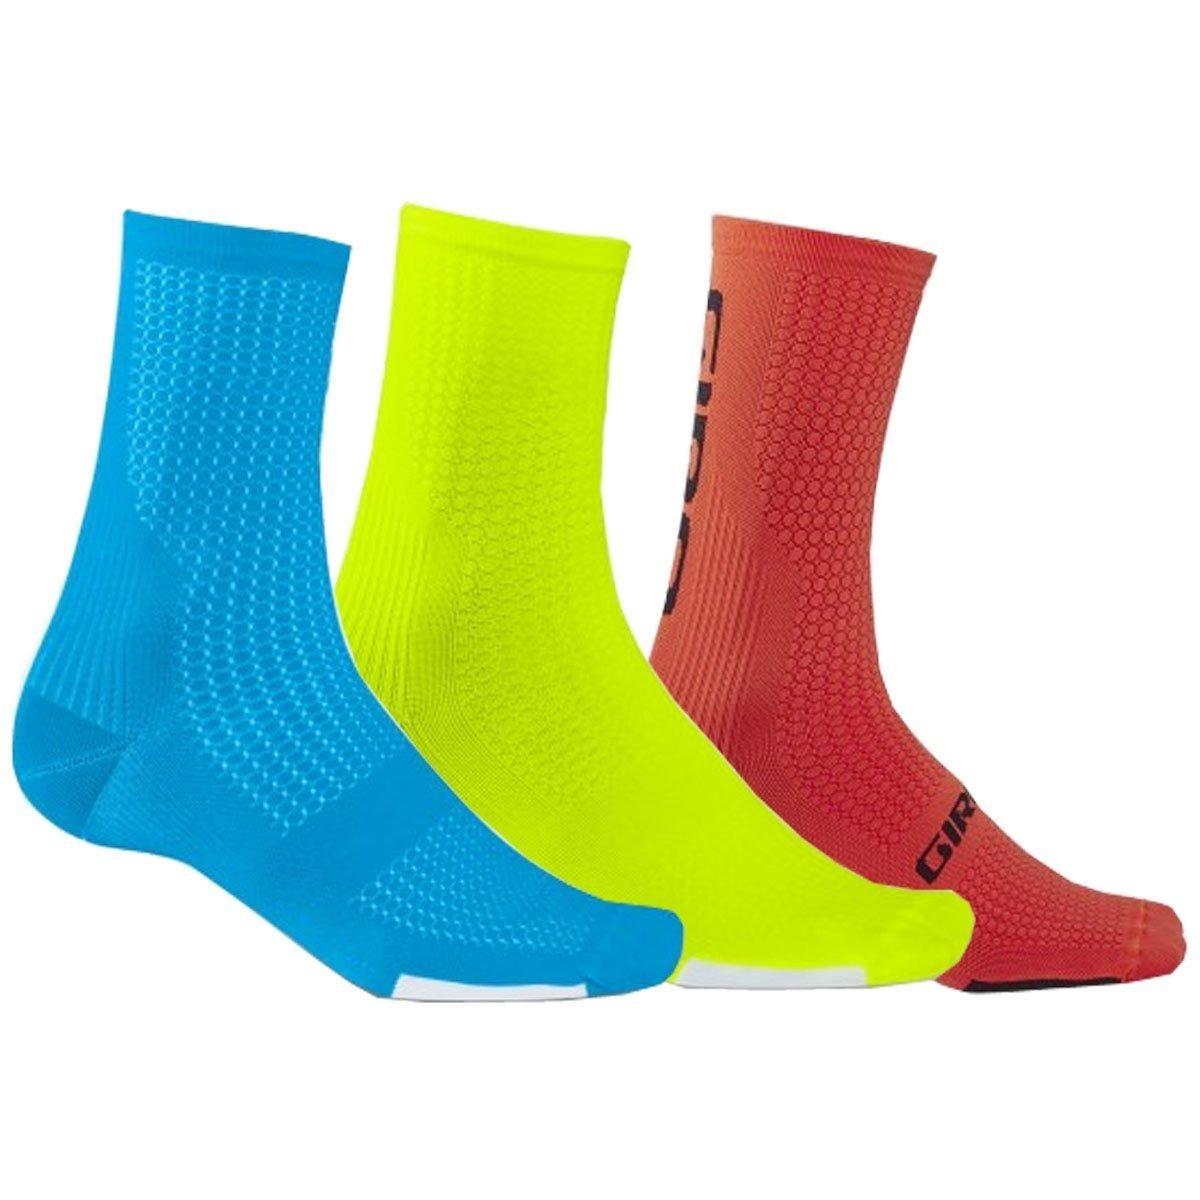 Giro HRC Team Bike Socks 3-Pk (Blue/Highlight Yellow/Vermillion, Large)